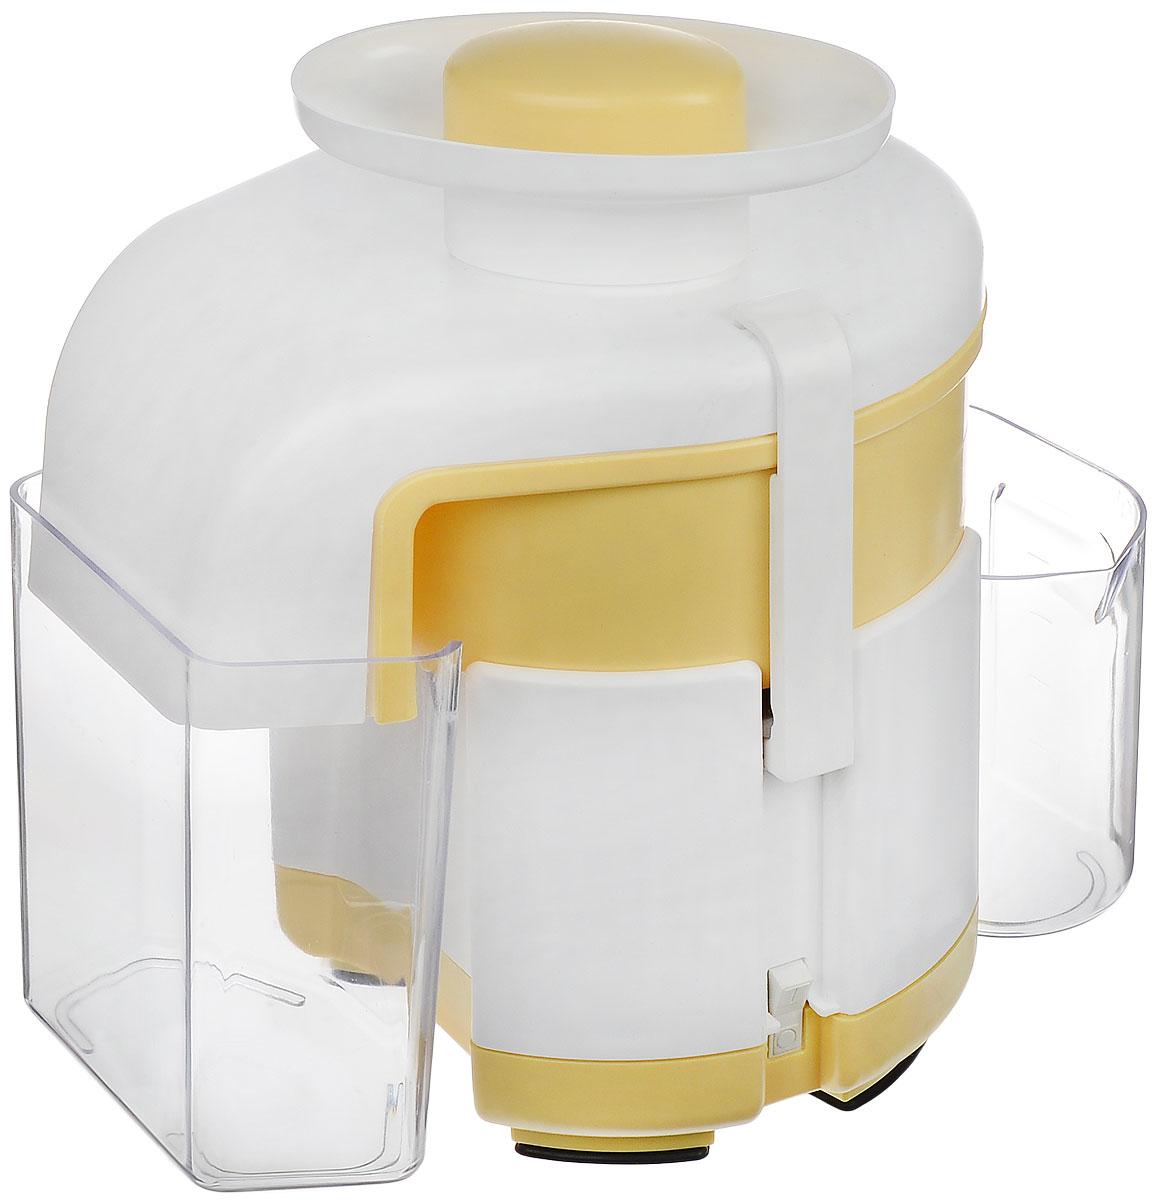 Журавинка СВСП 102 П, White Yellow соковыжималка - Соковыжималки